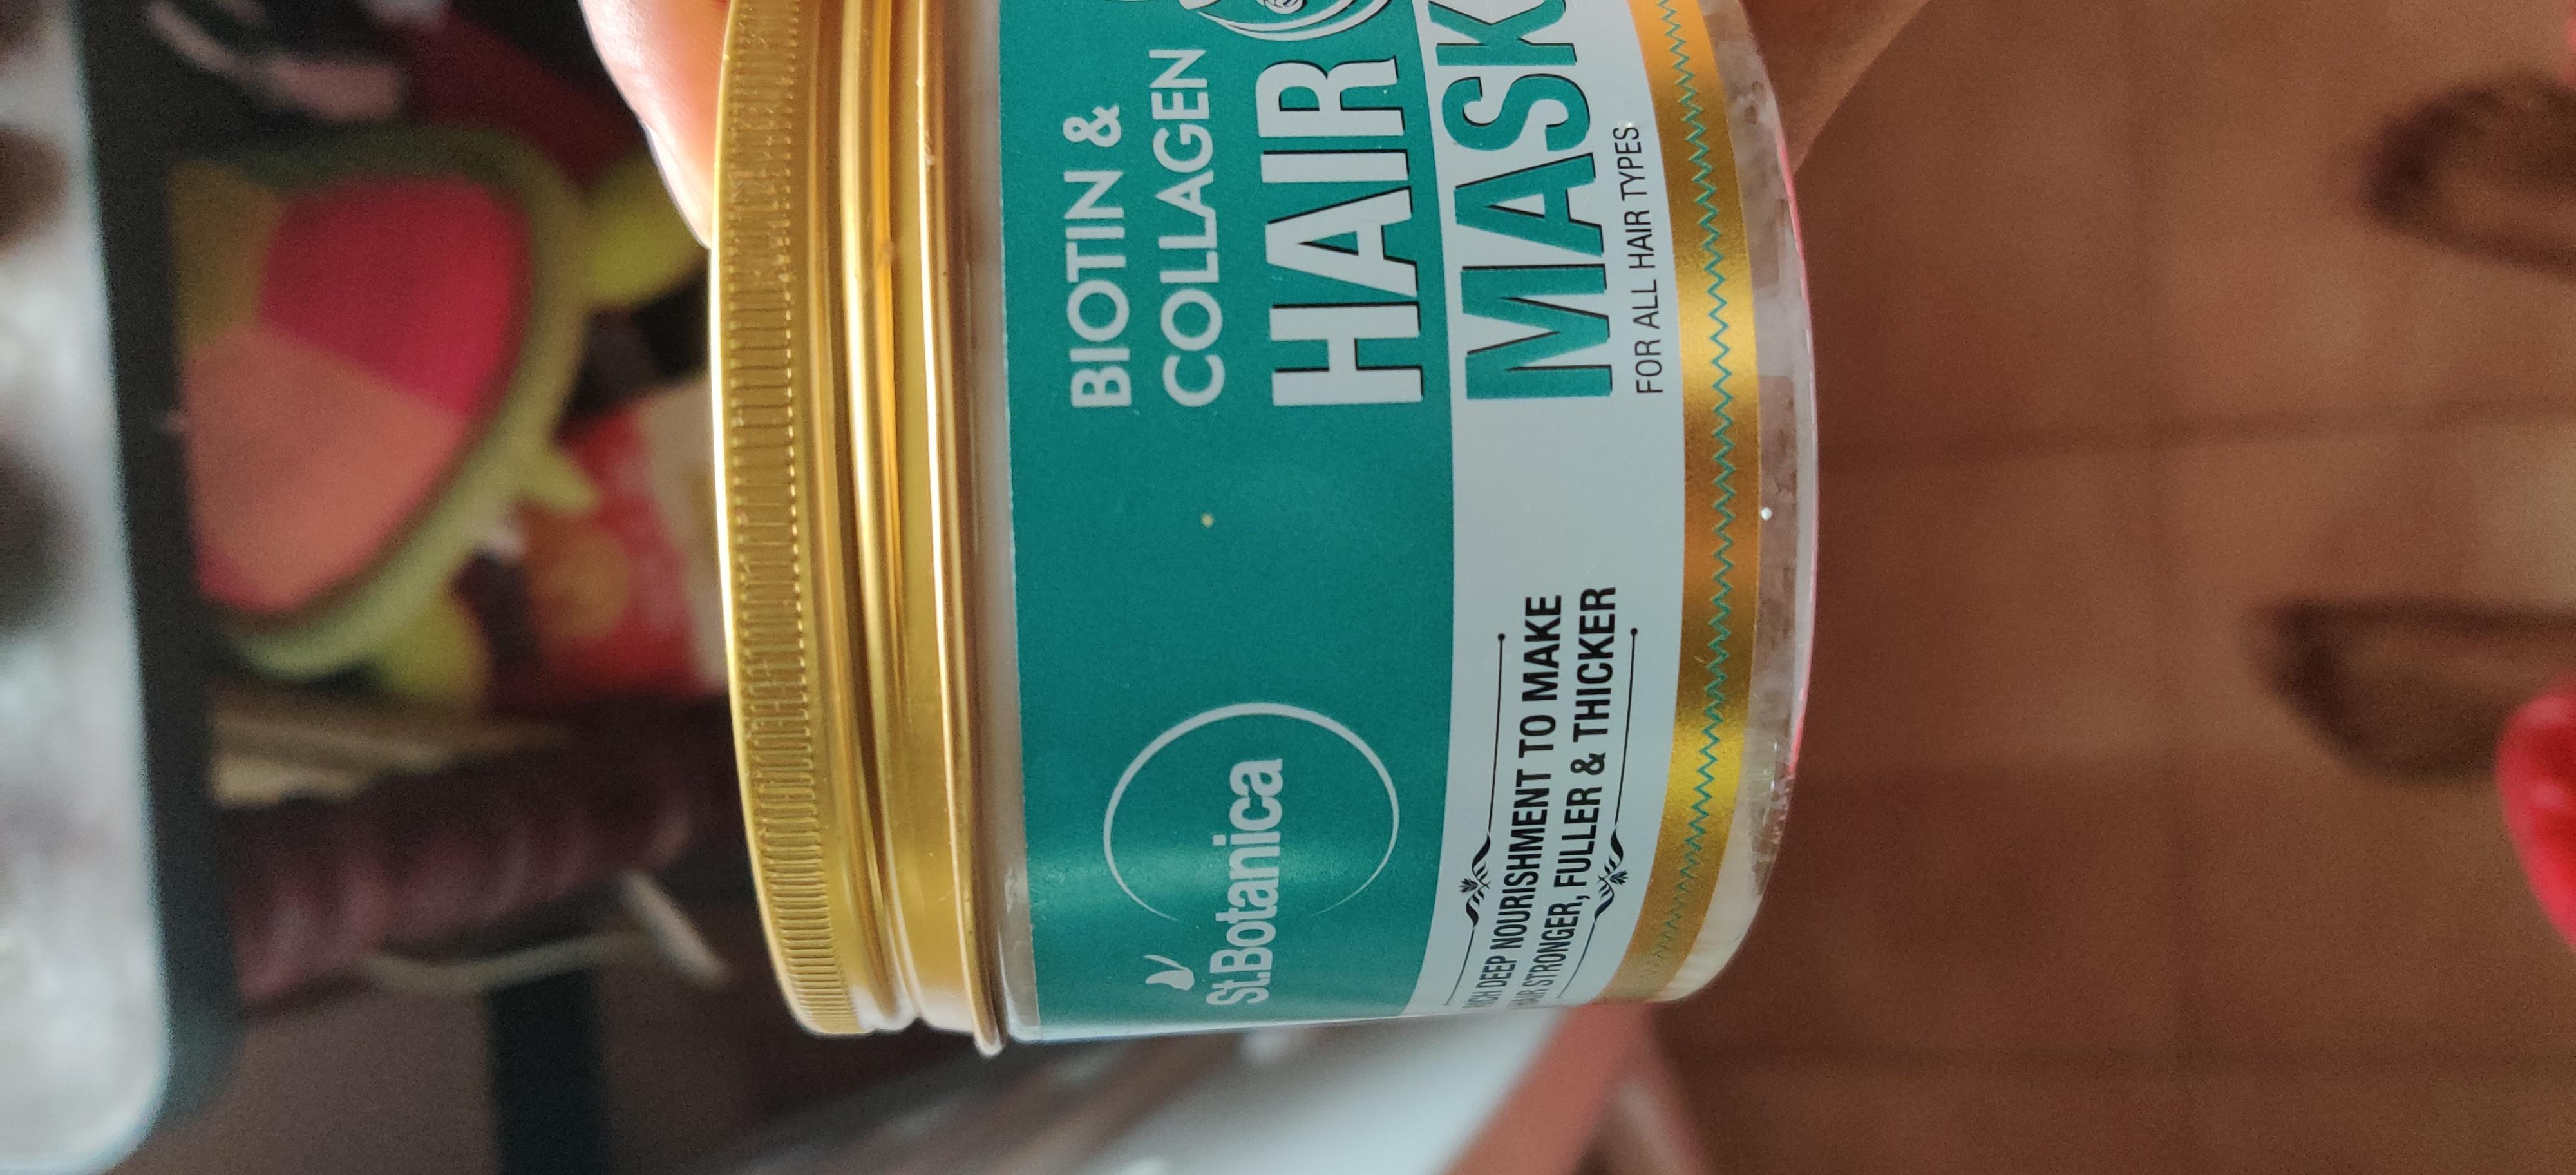 St.Botanica Biotin & Collagen Hair Mask pic 1-Great for smooth hair-By sadhvi_mythili